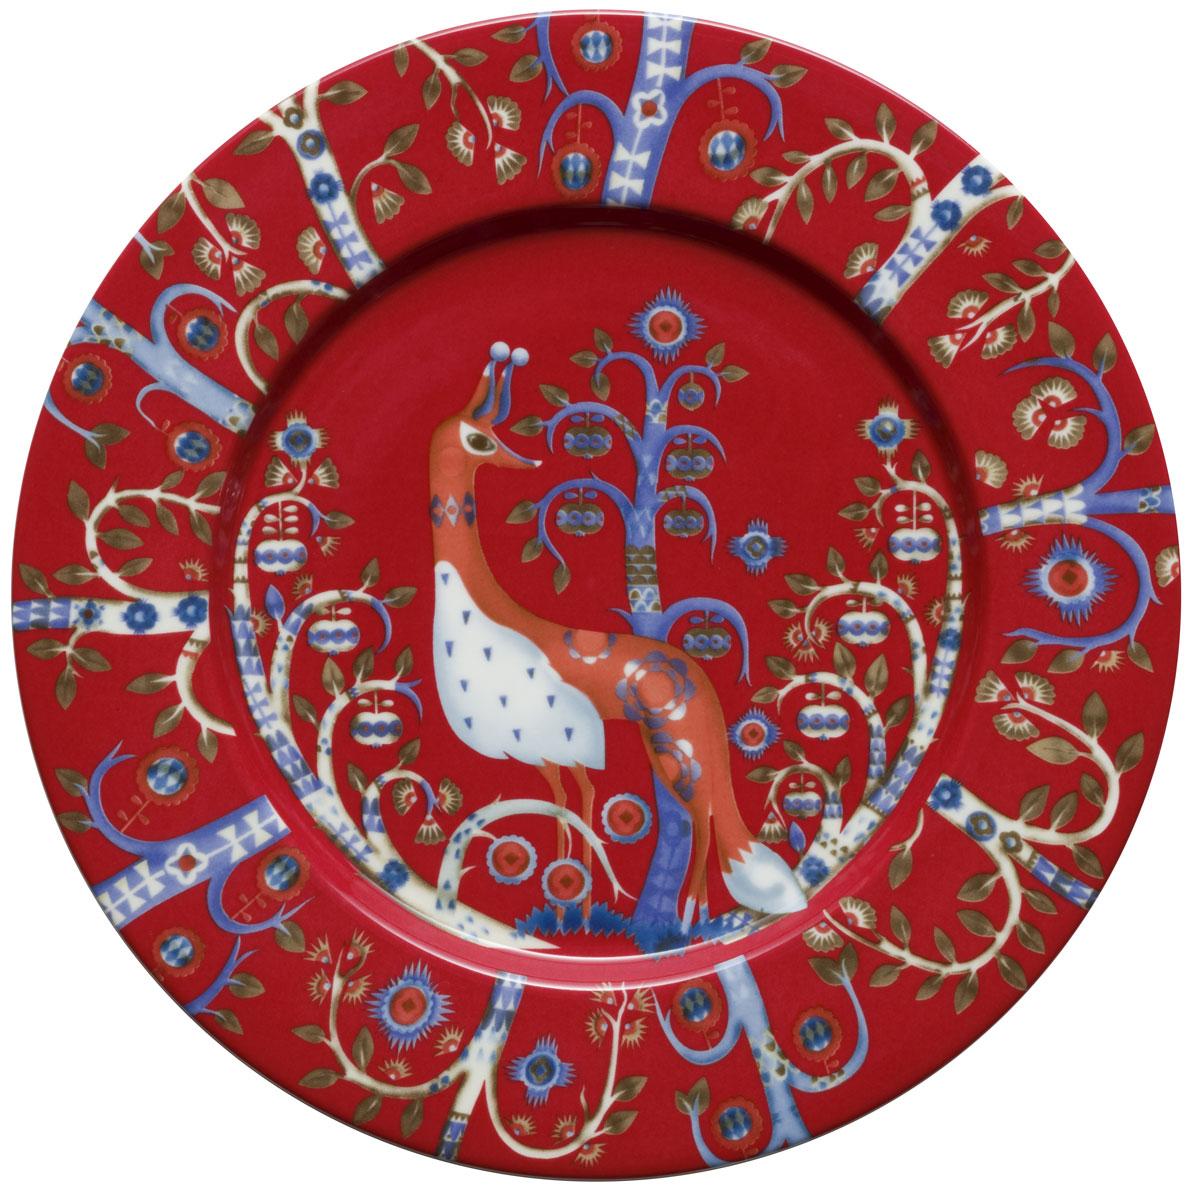 Тарелка Iittala Taika, цвет: красный, диаметр 22 см1012477